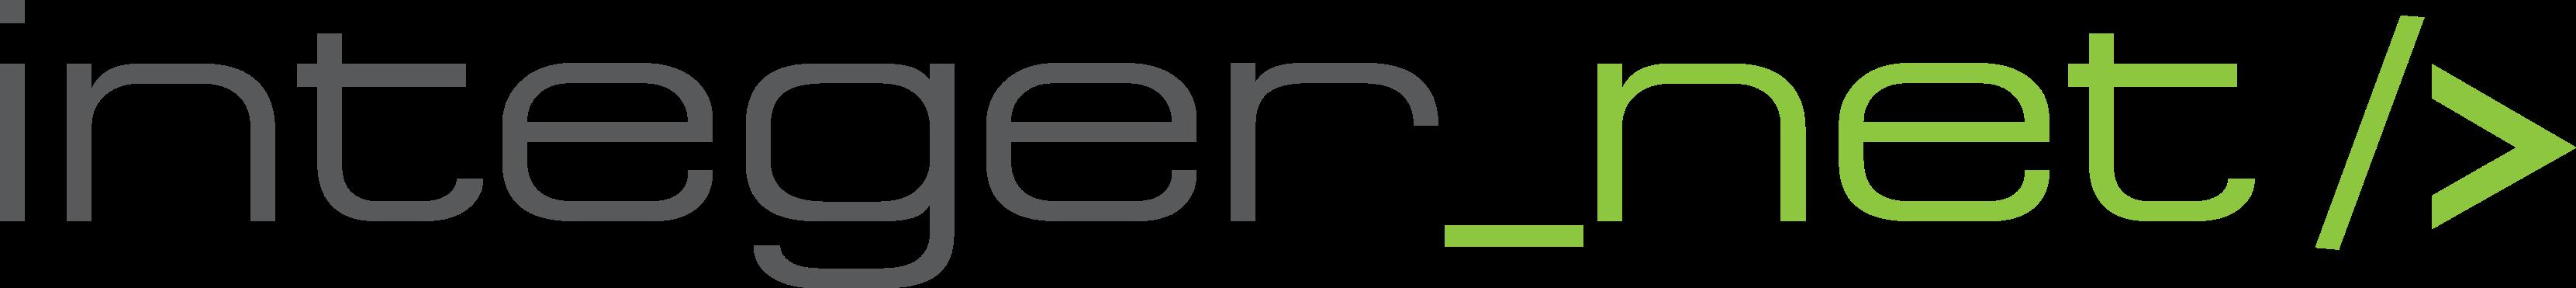 integer_net